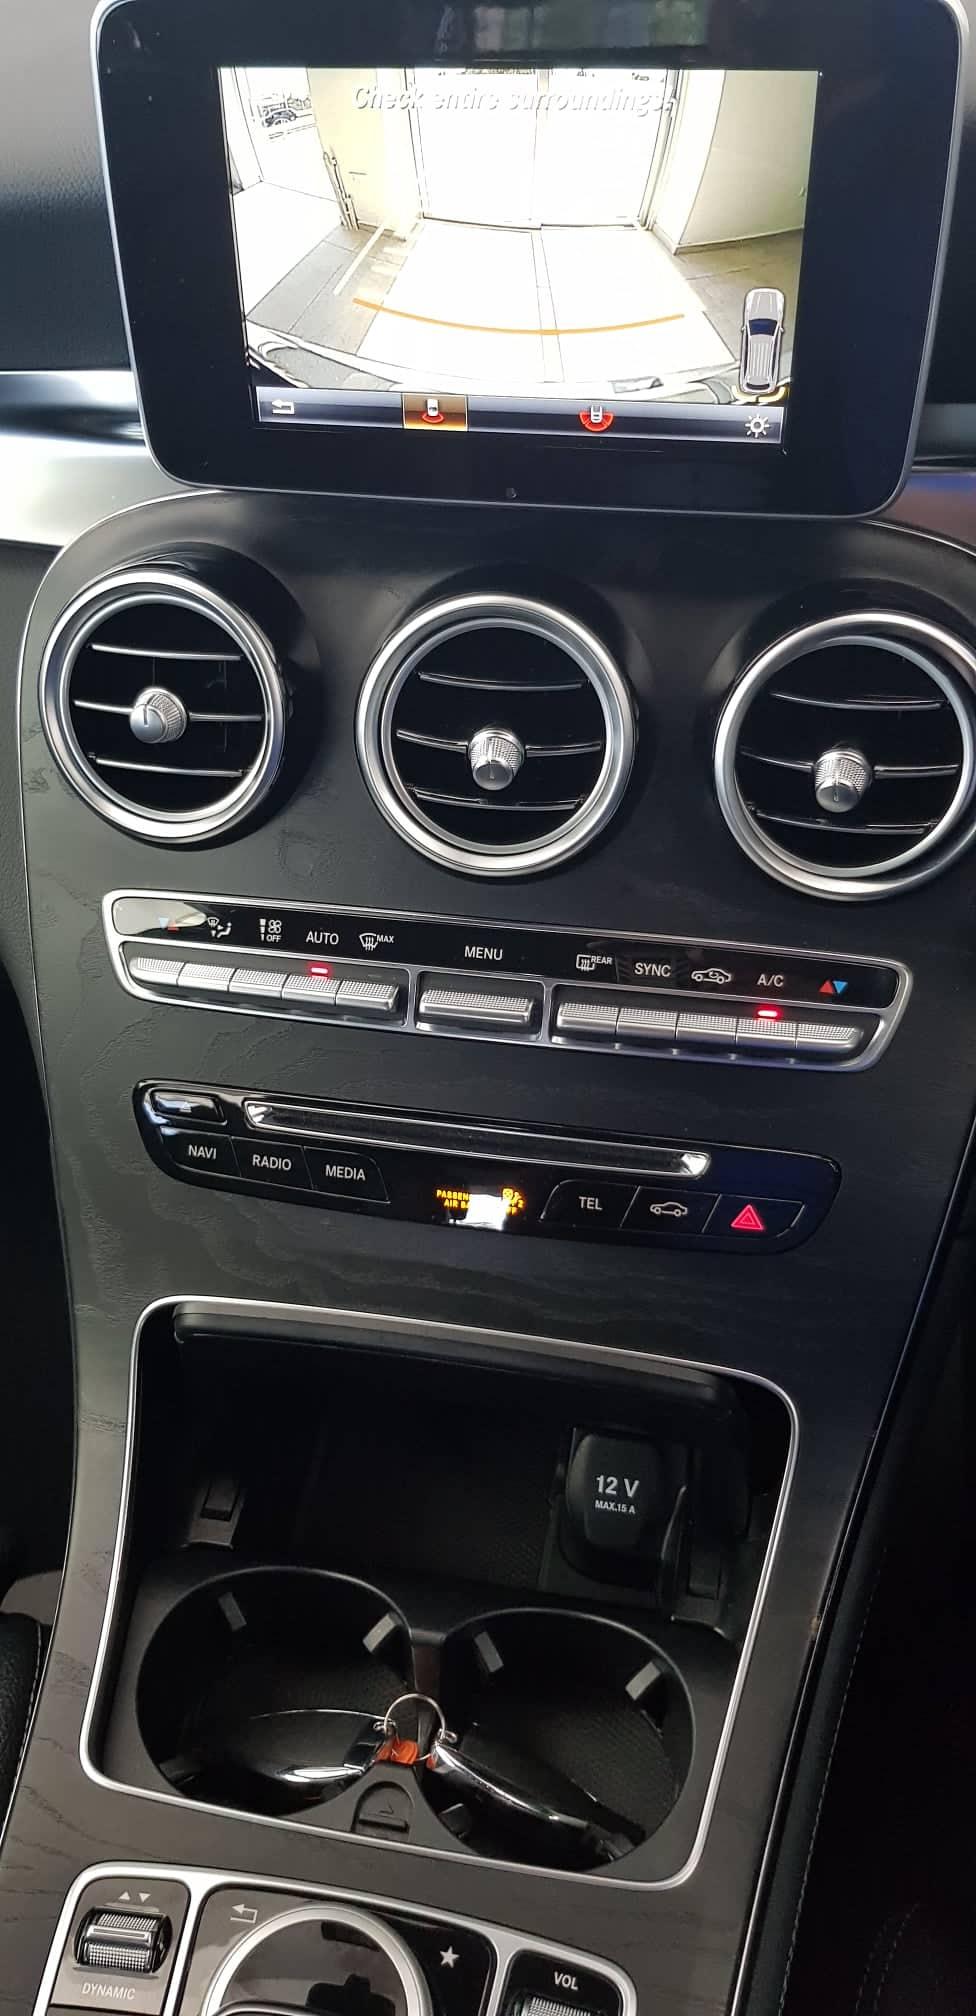 Mercedes GLC 250D AMG 4 MATIC